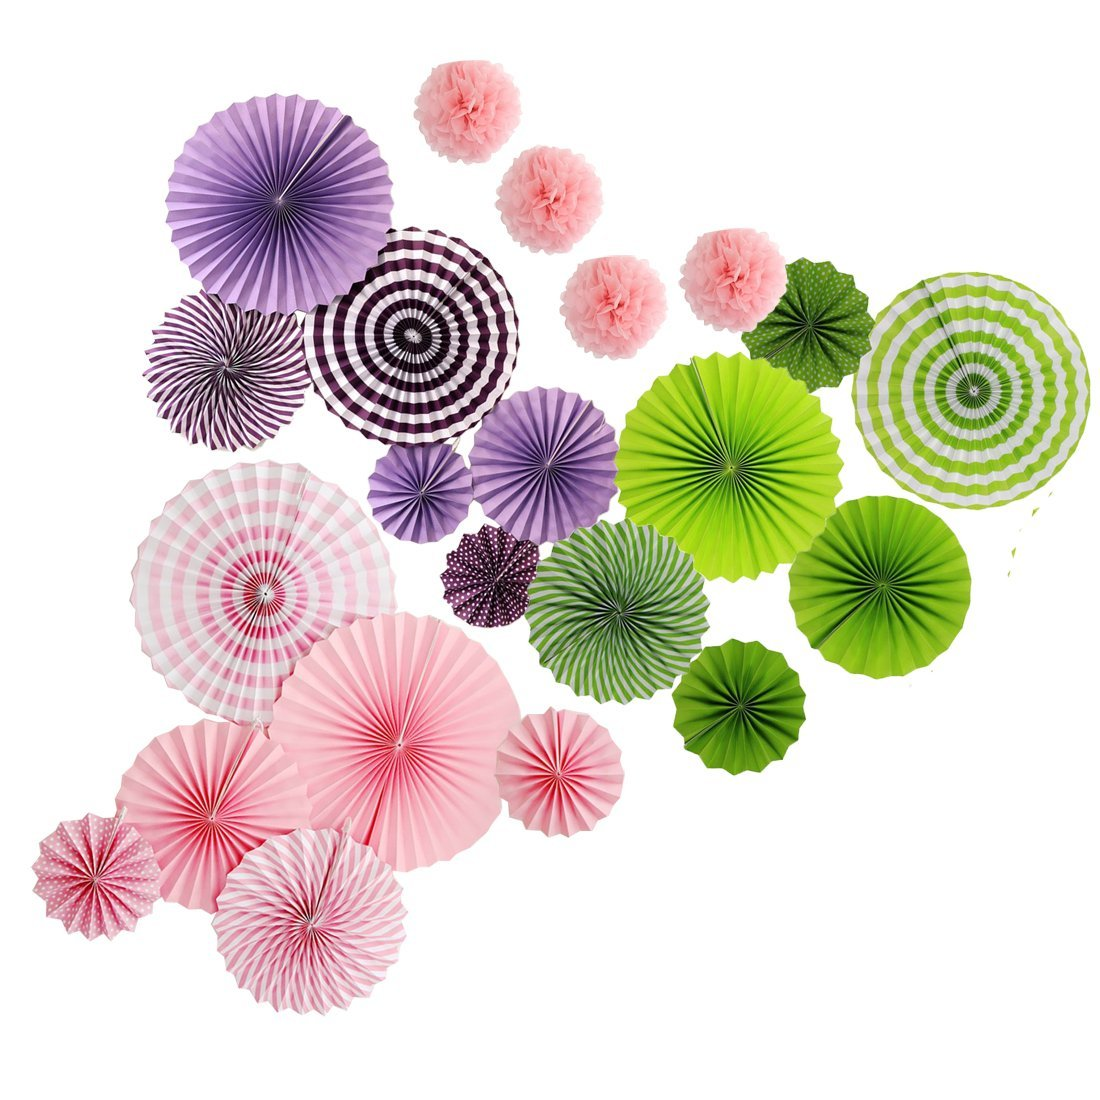 Get Quotations · 18pcs Hanging Decorative Folding Paper Fan Flowers and  4pcs Tissue Paper Pom Poms Kit For Wedding 26811ceca7